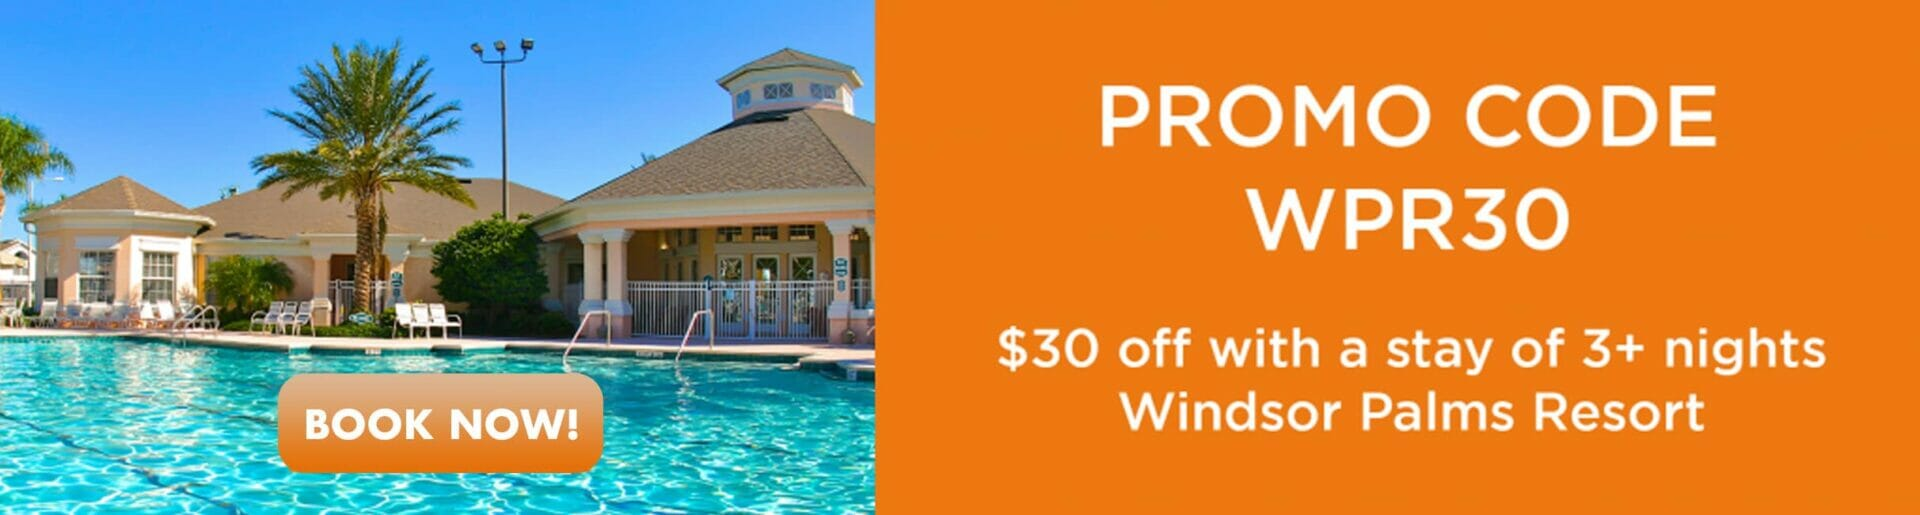 Promo Windsor Palms 30% off Orlando Vacation Discounts